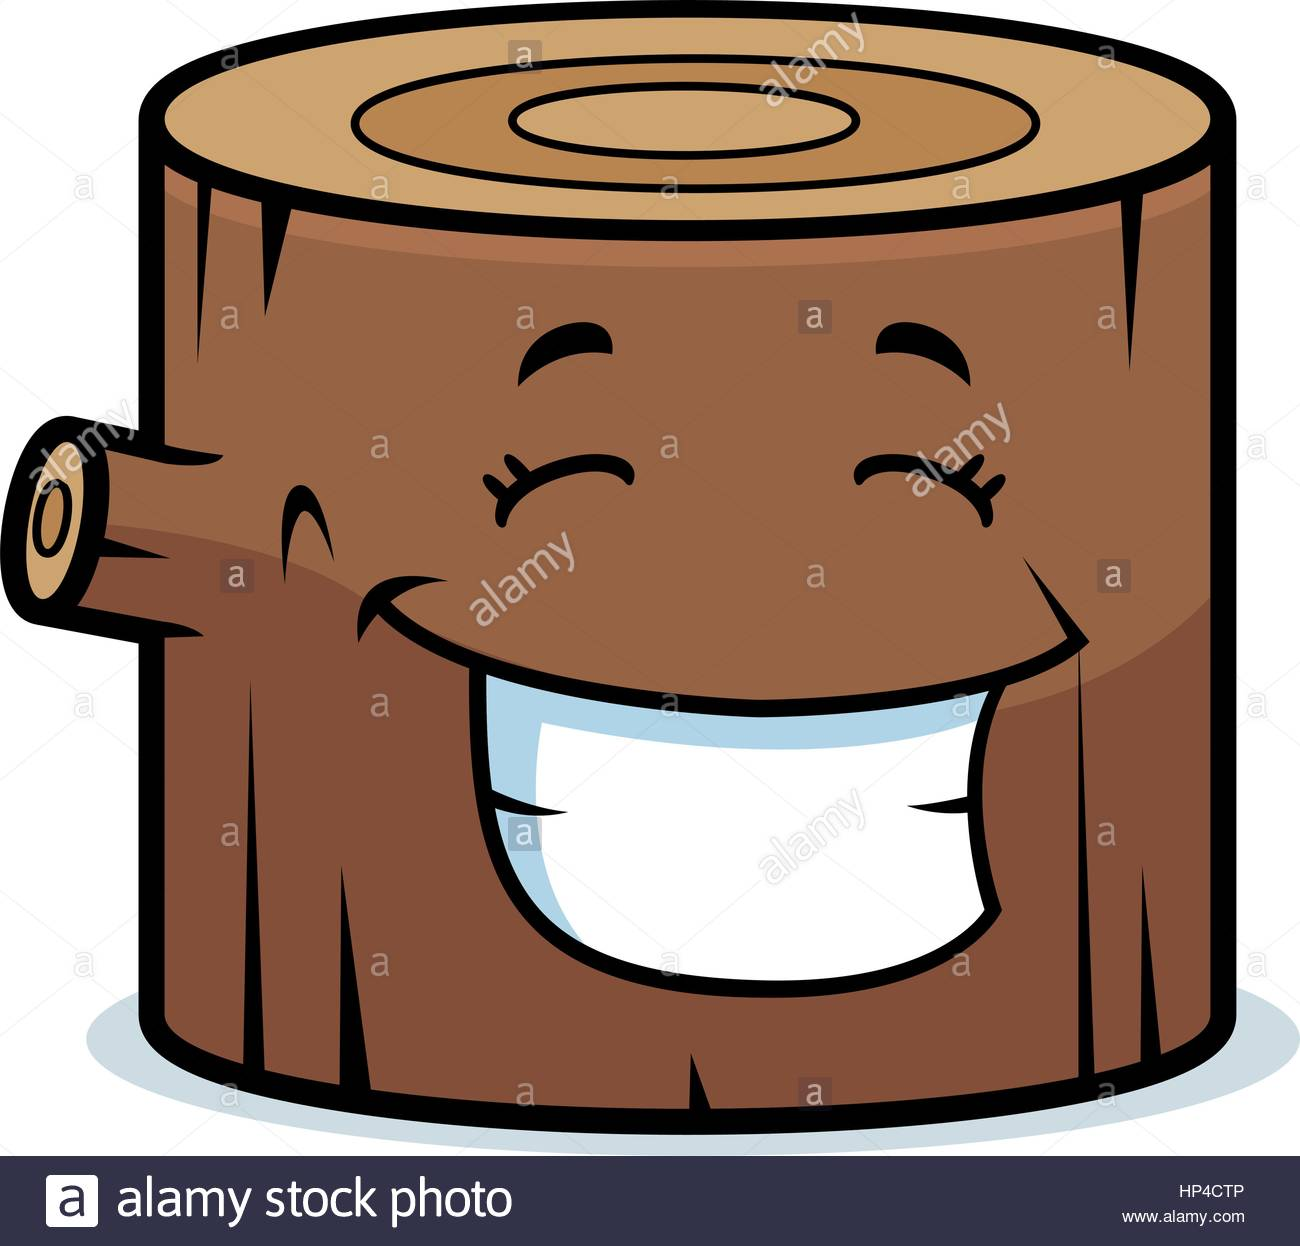 Wood log free download. Firewood clipart cartoon